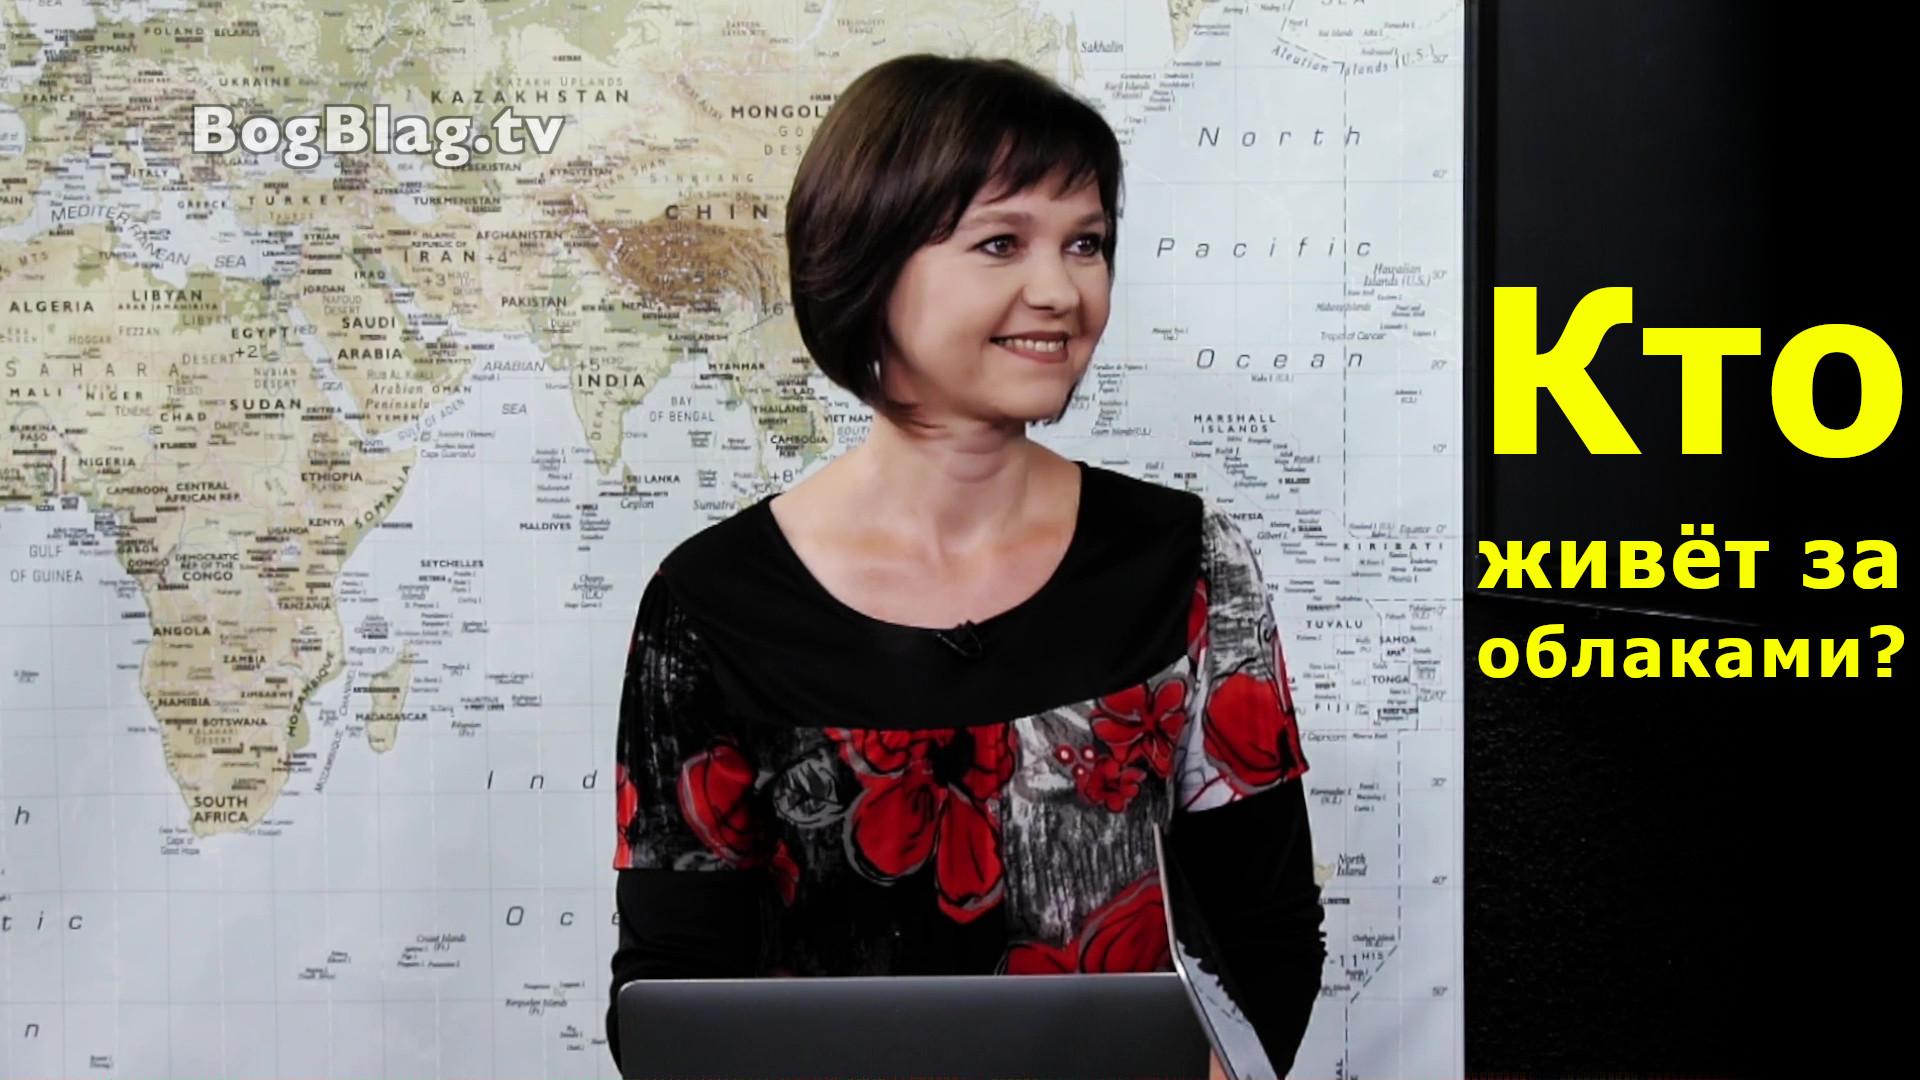 Жемчужина Тибета - Часть 1 - Кто живёт за облаками?